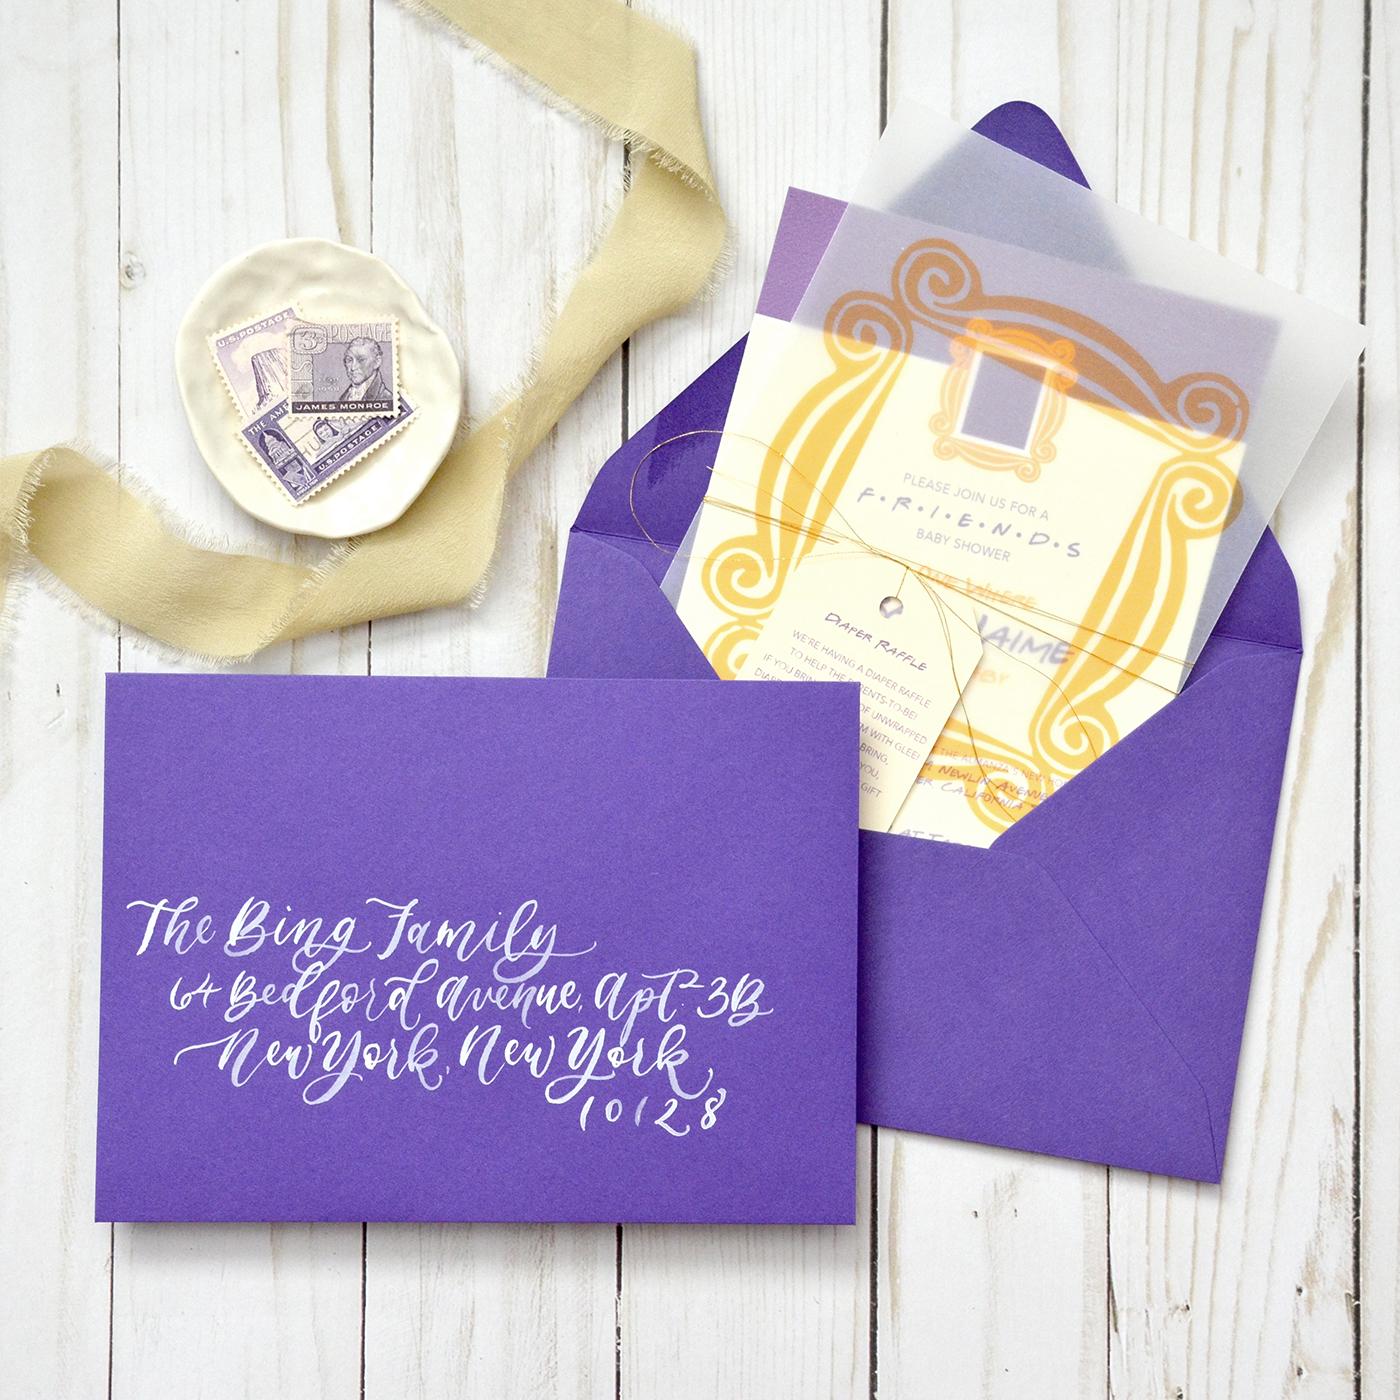 Sam Allen Creates – Friends Themed Baby Shower with Purple Envelope Brush Calligraphy Addressing